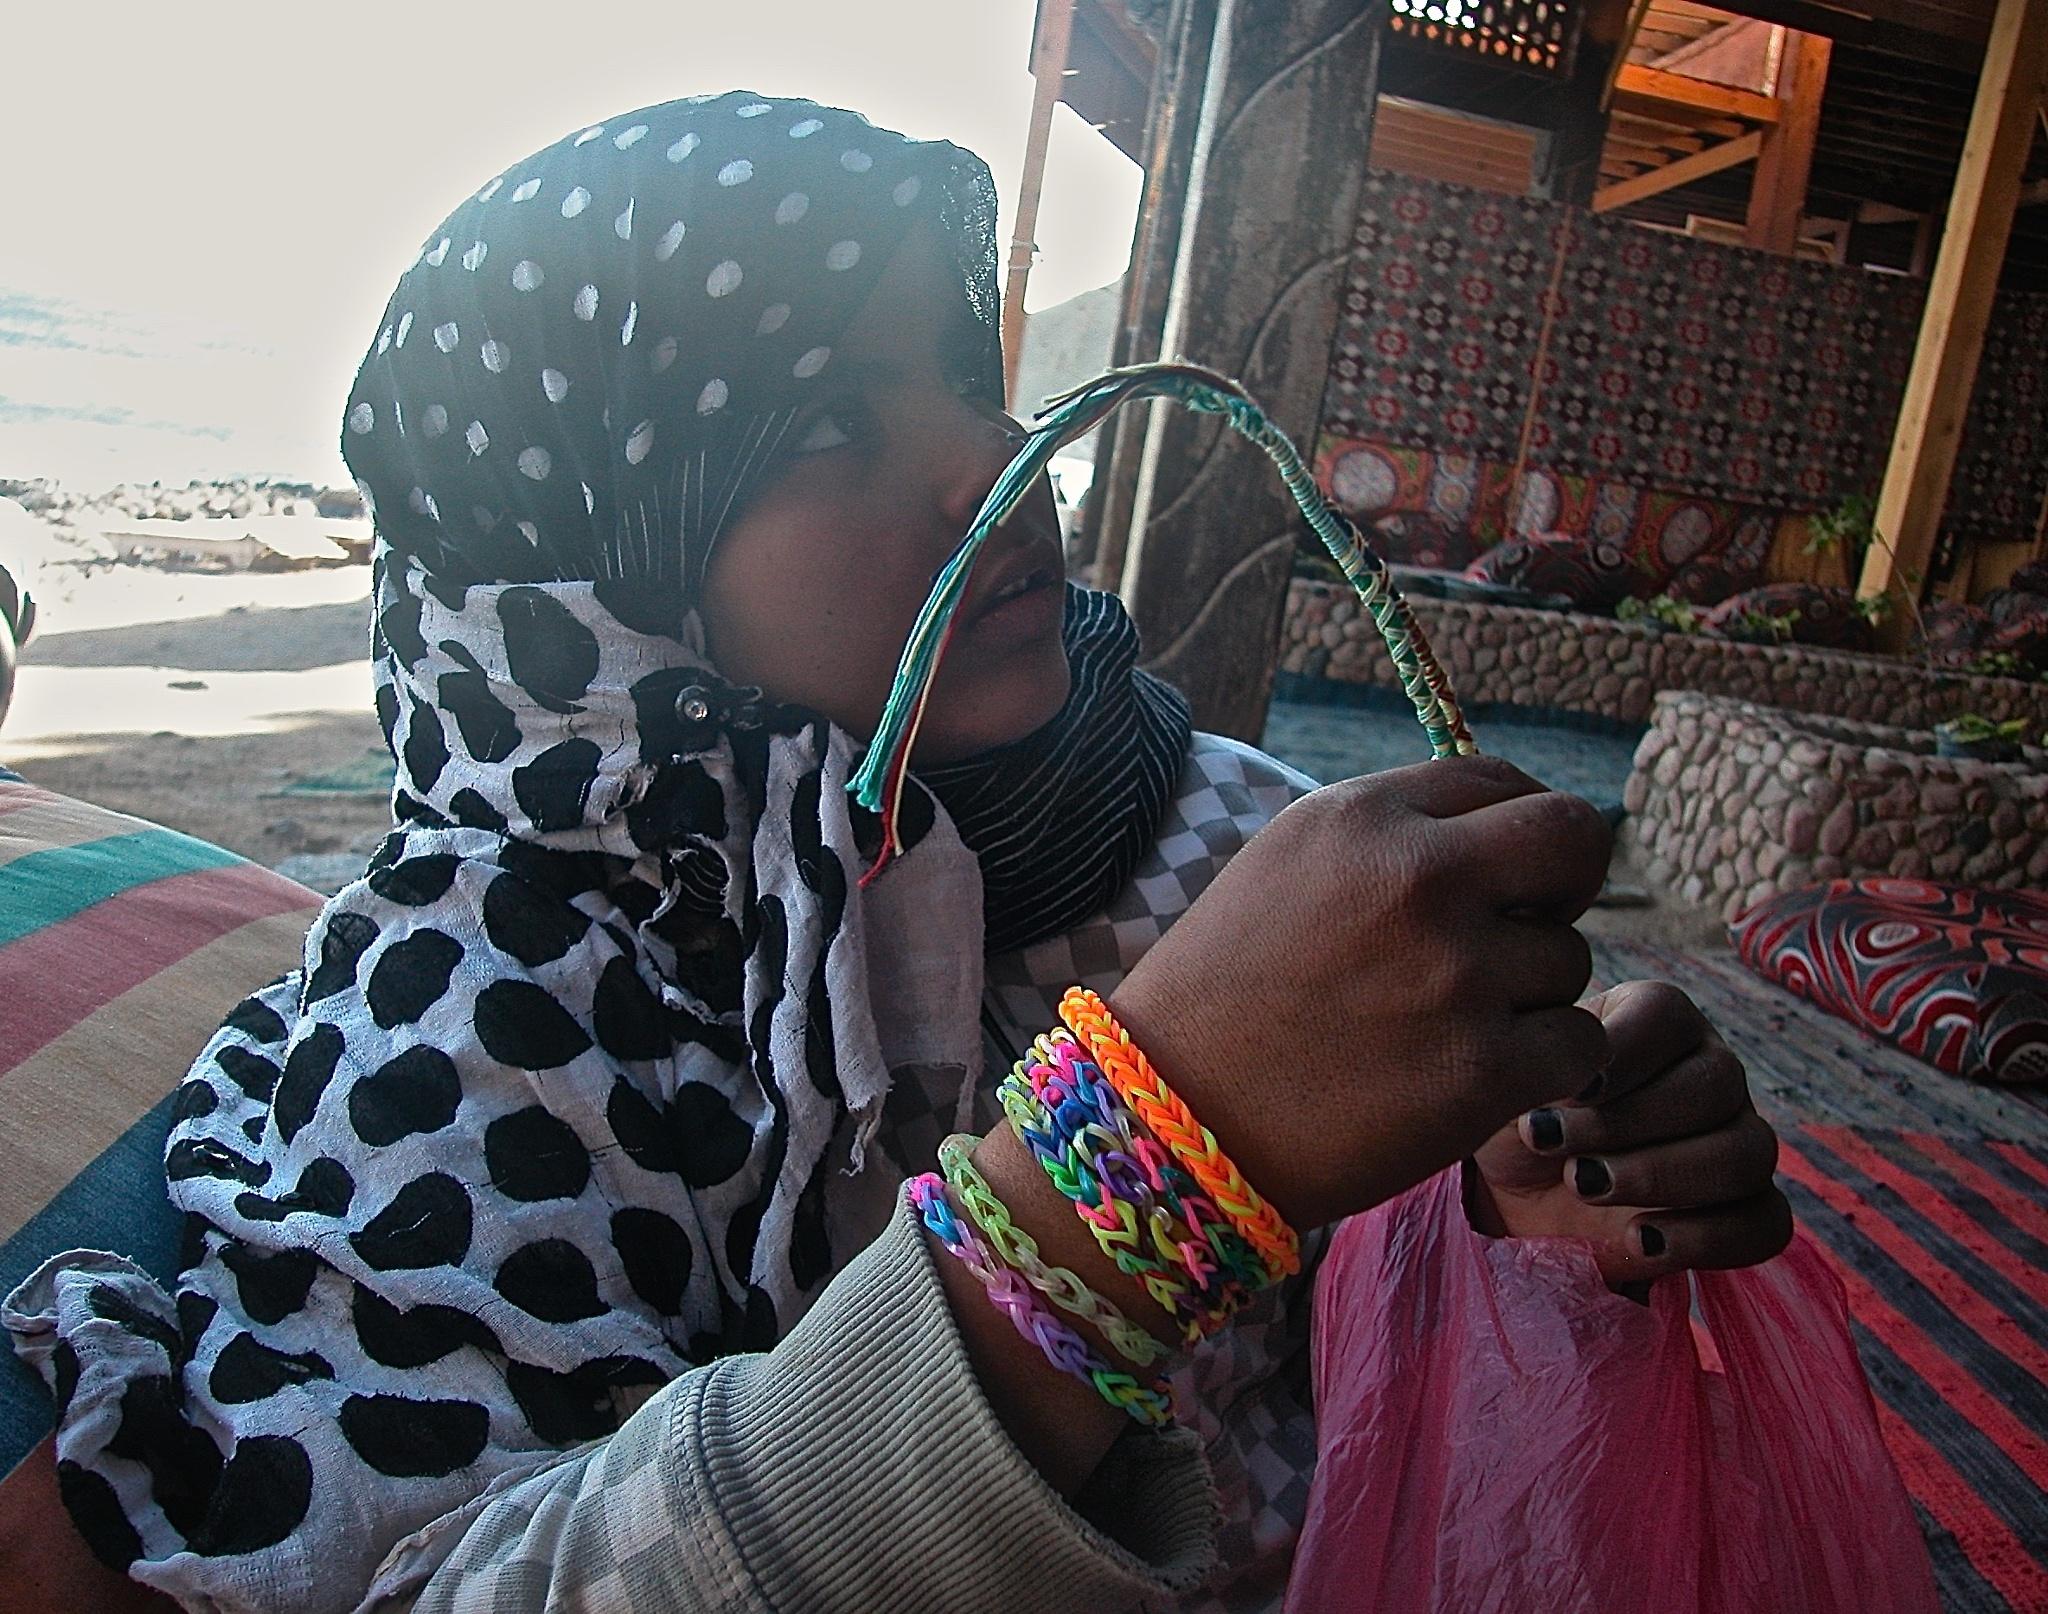 Bedouin Girl by keithjeggo